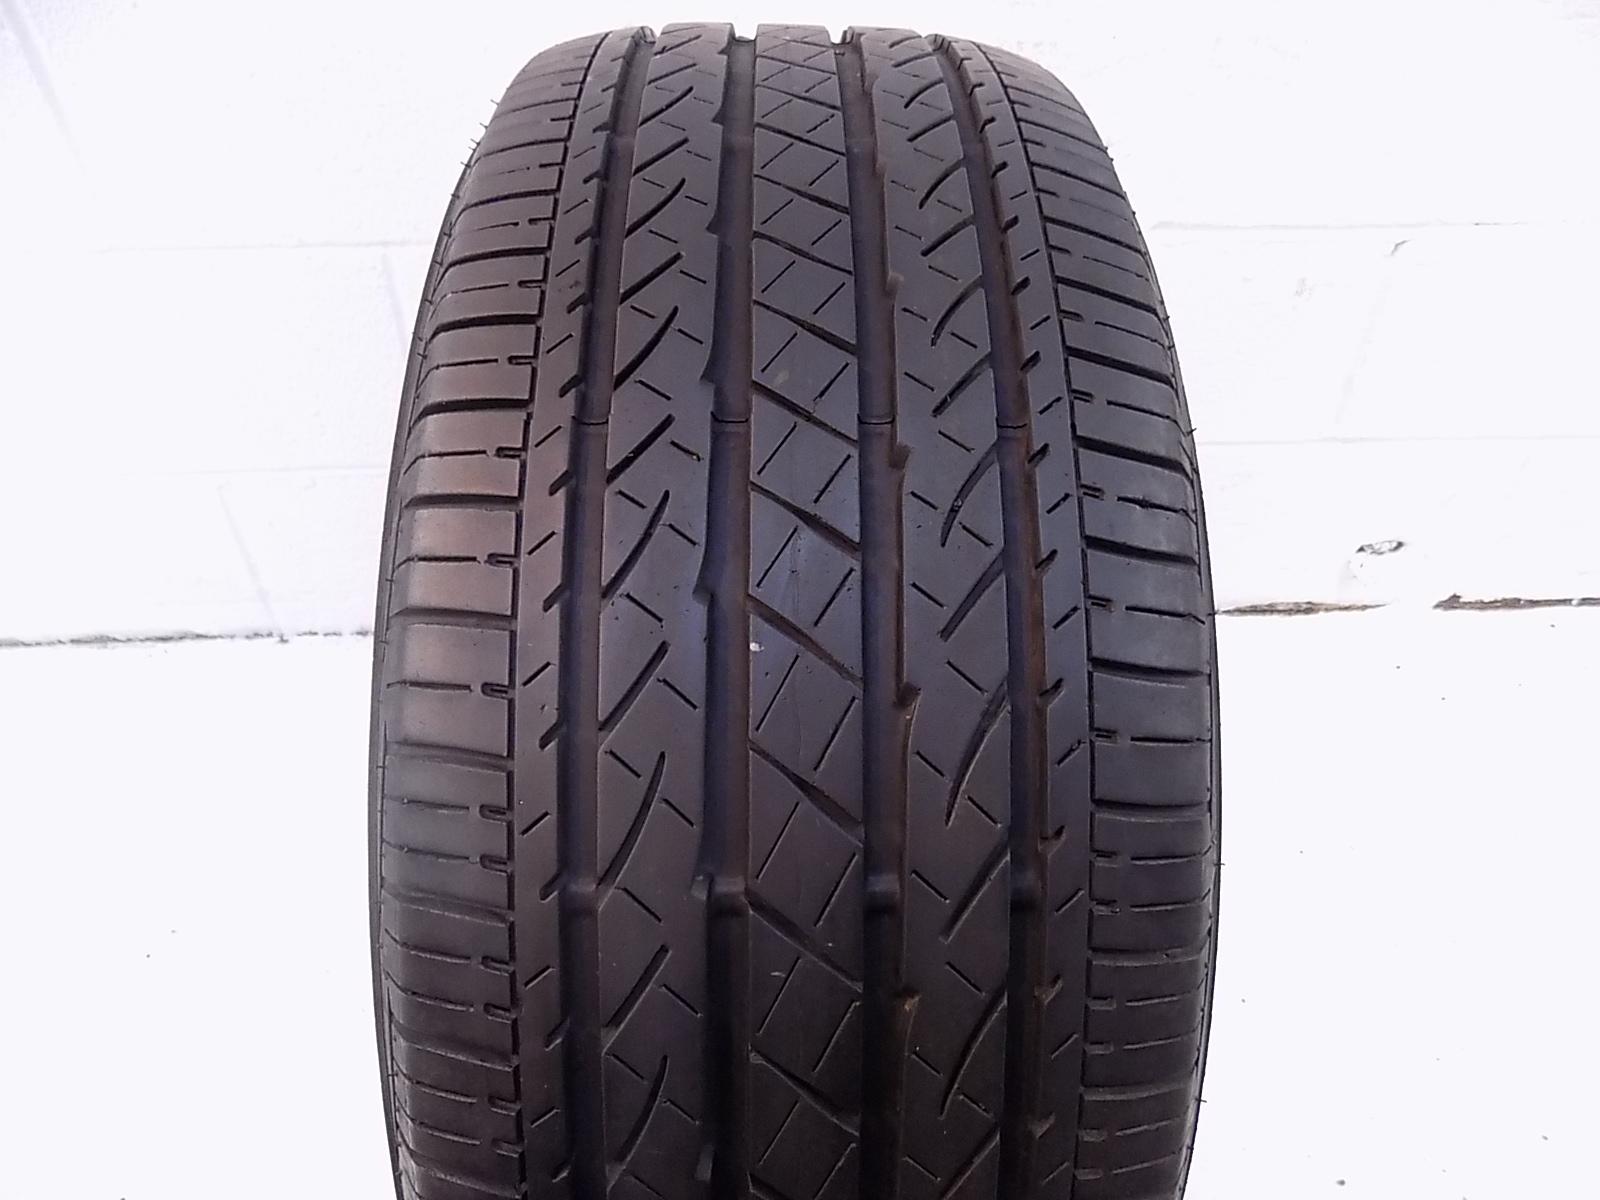 Bridgestone Potenza Re97As Review >> 215 55r16 V R16 Bridgestone Potenza Re97as All Season Tire